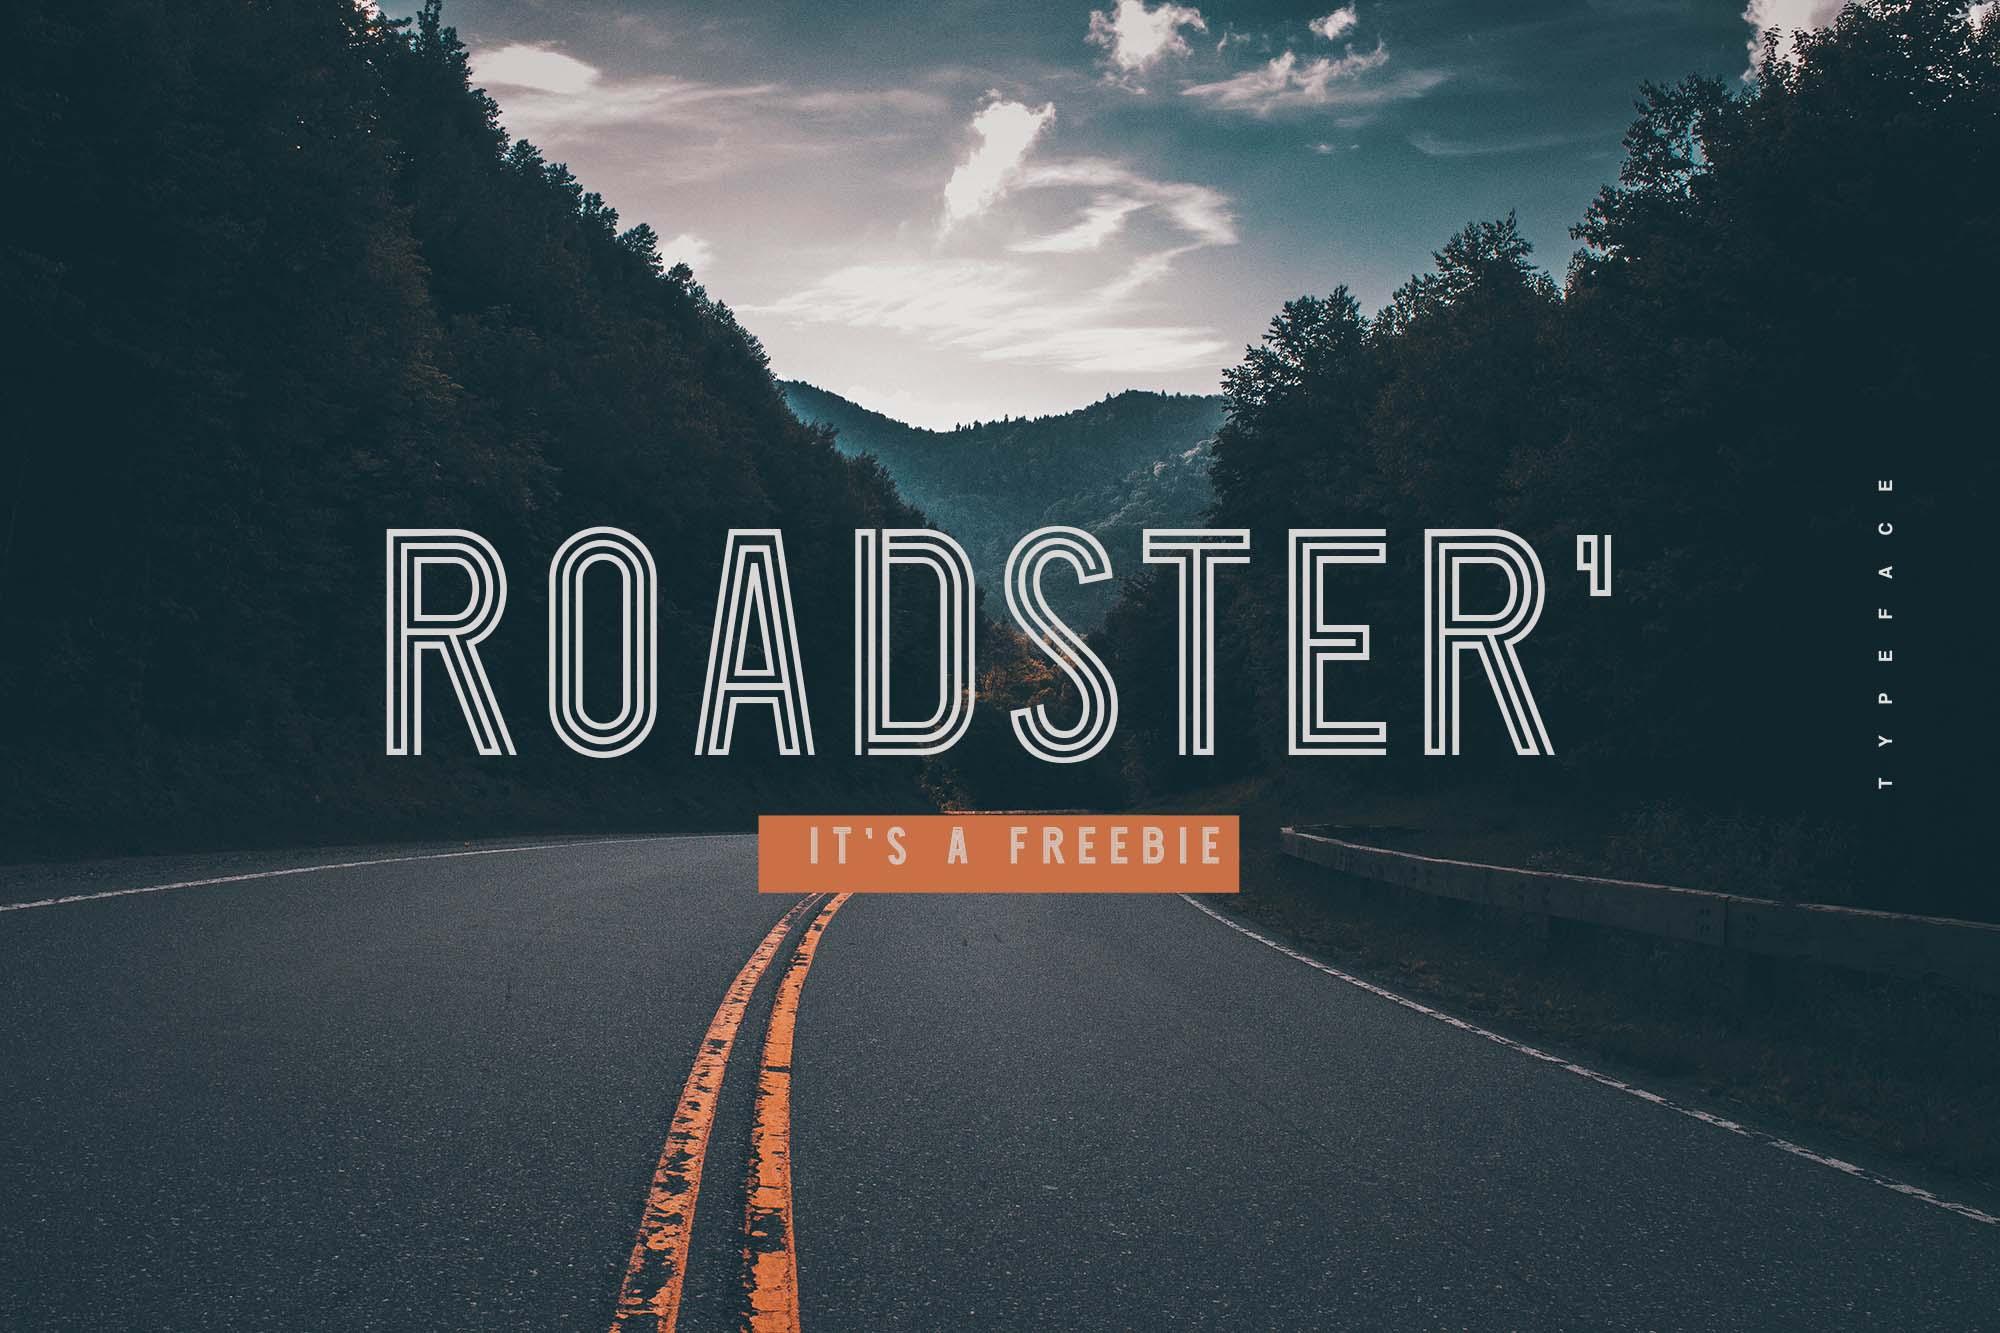 Roadster Font